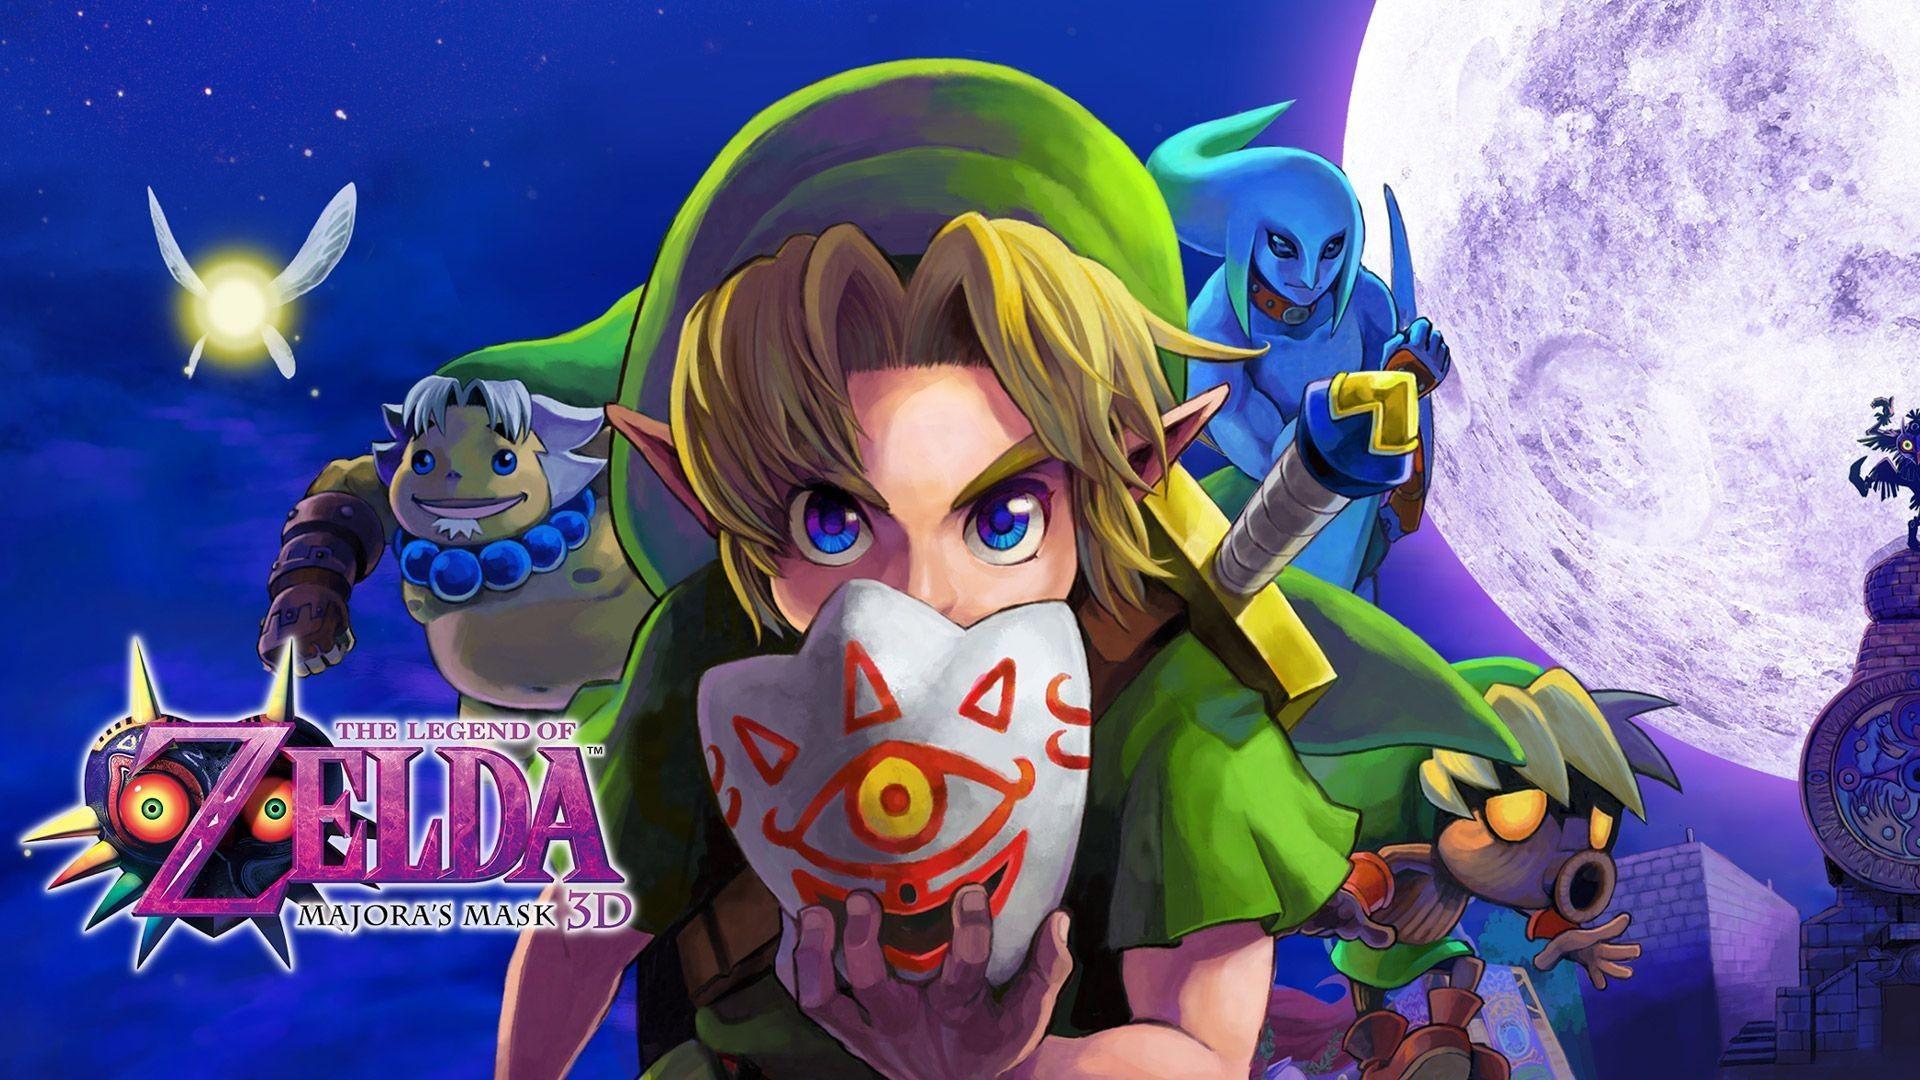 The Legend of Zelda Majoras Mask wallpaper 1080p hd desktop 1920X1080